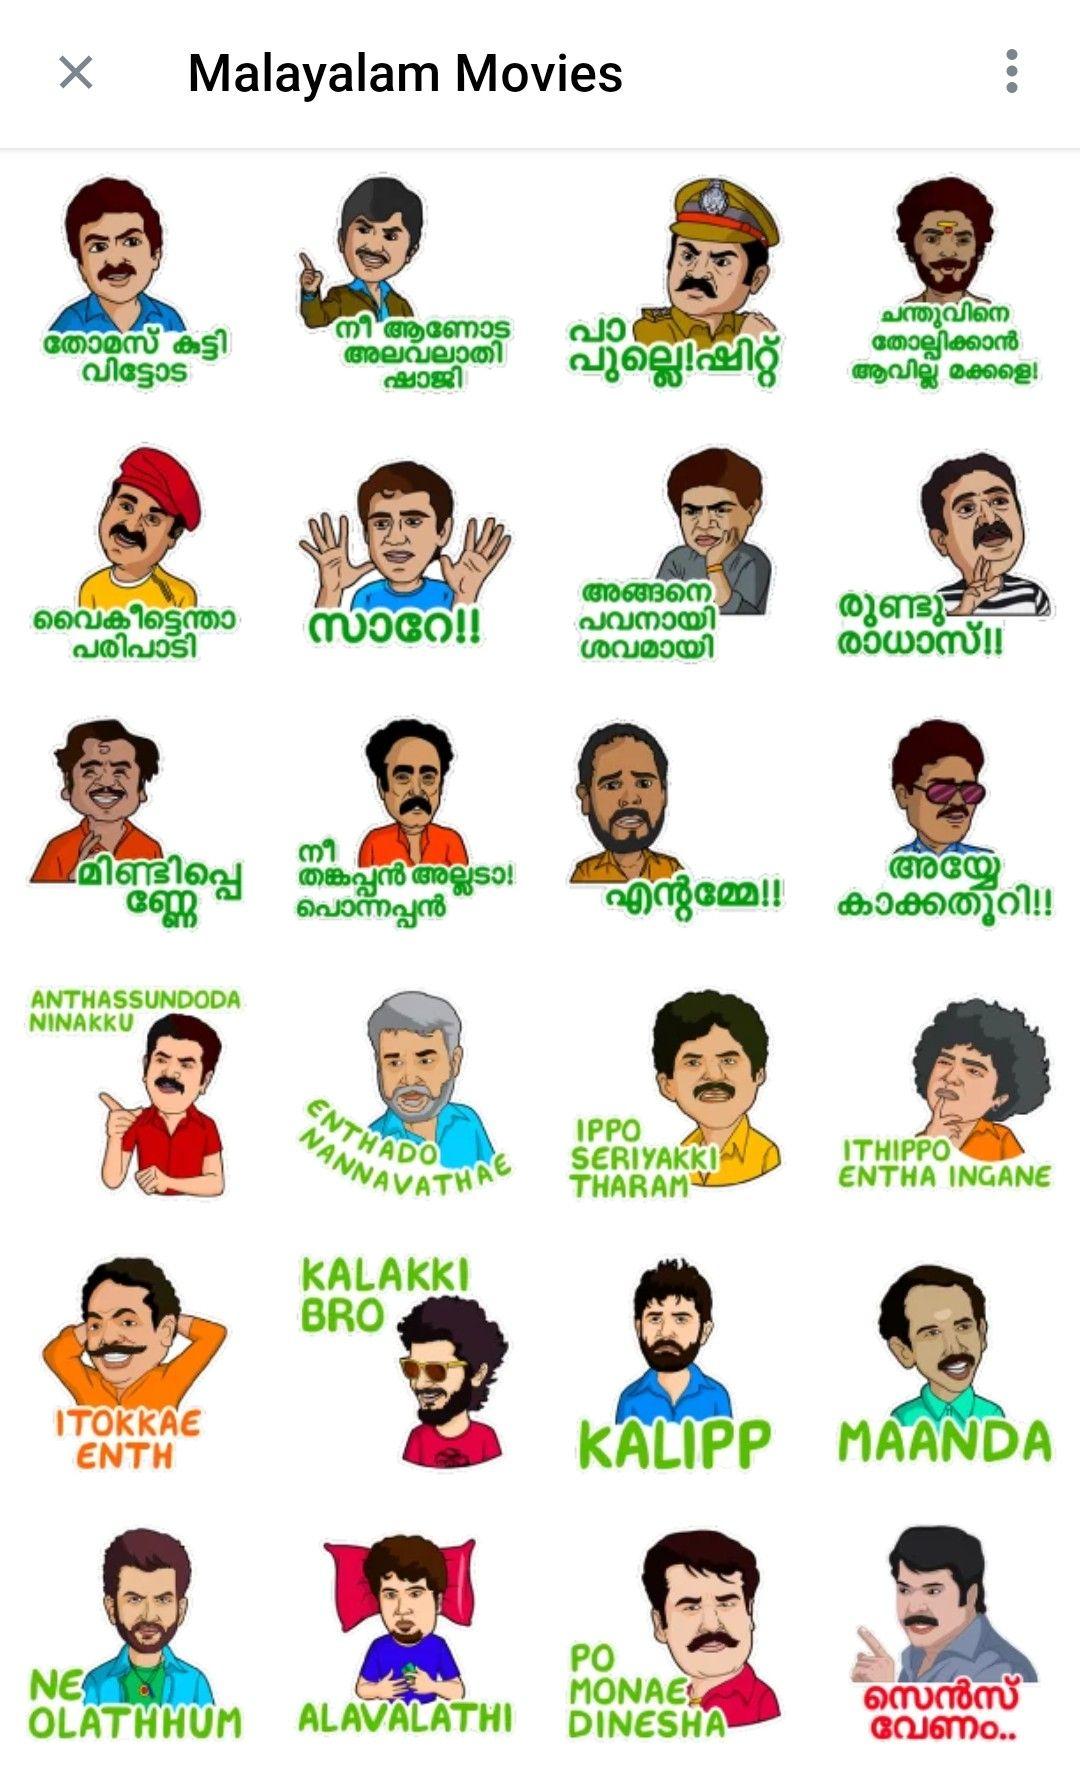 Download Malayalam Movies Telegram Sticker pack   Telegram stickers